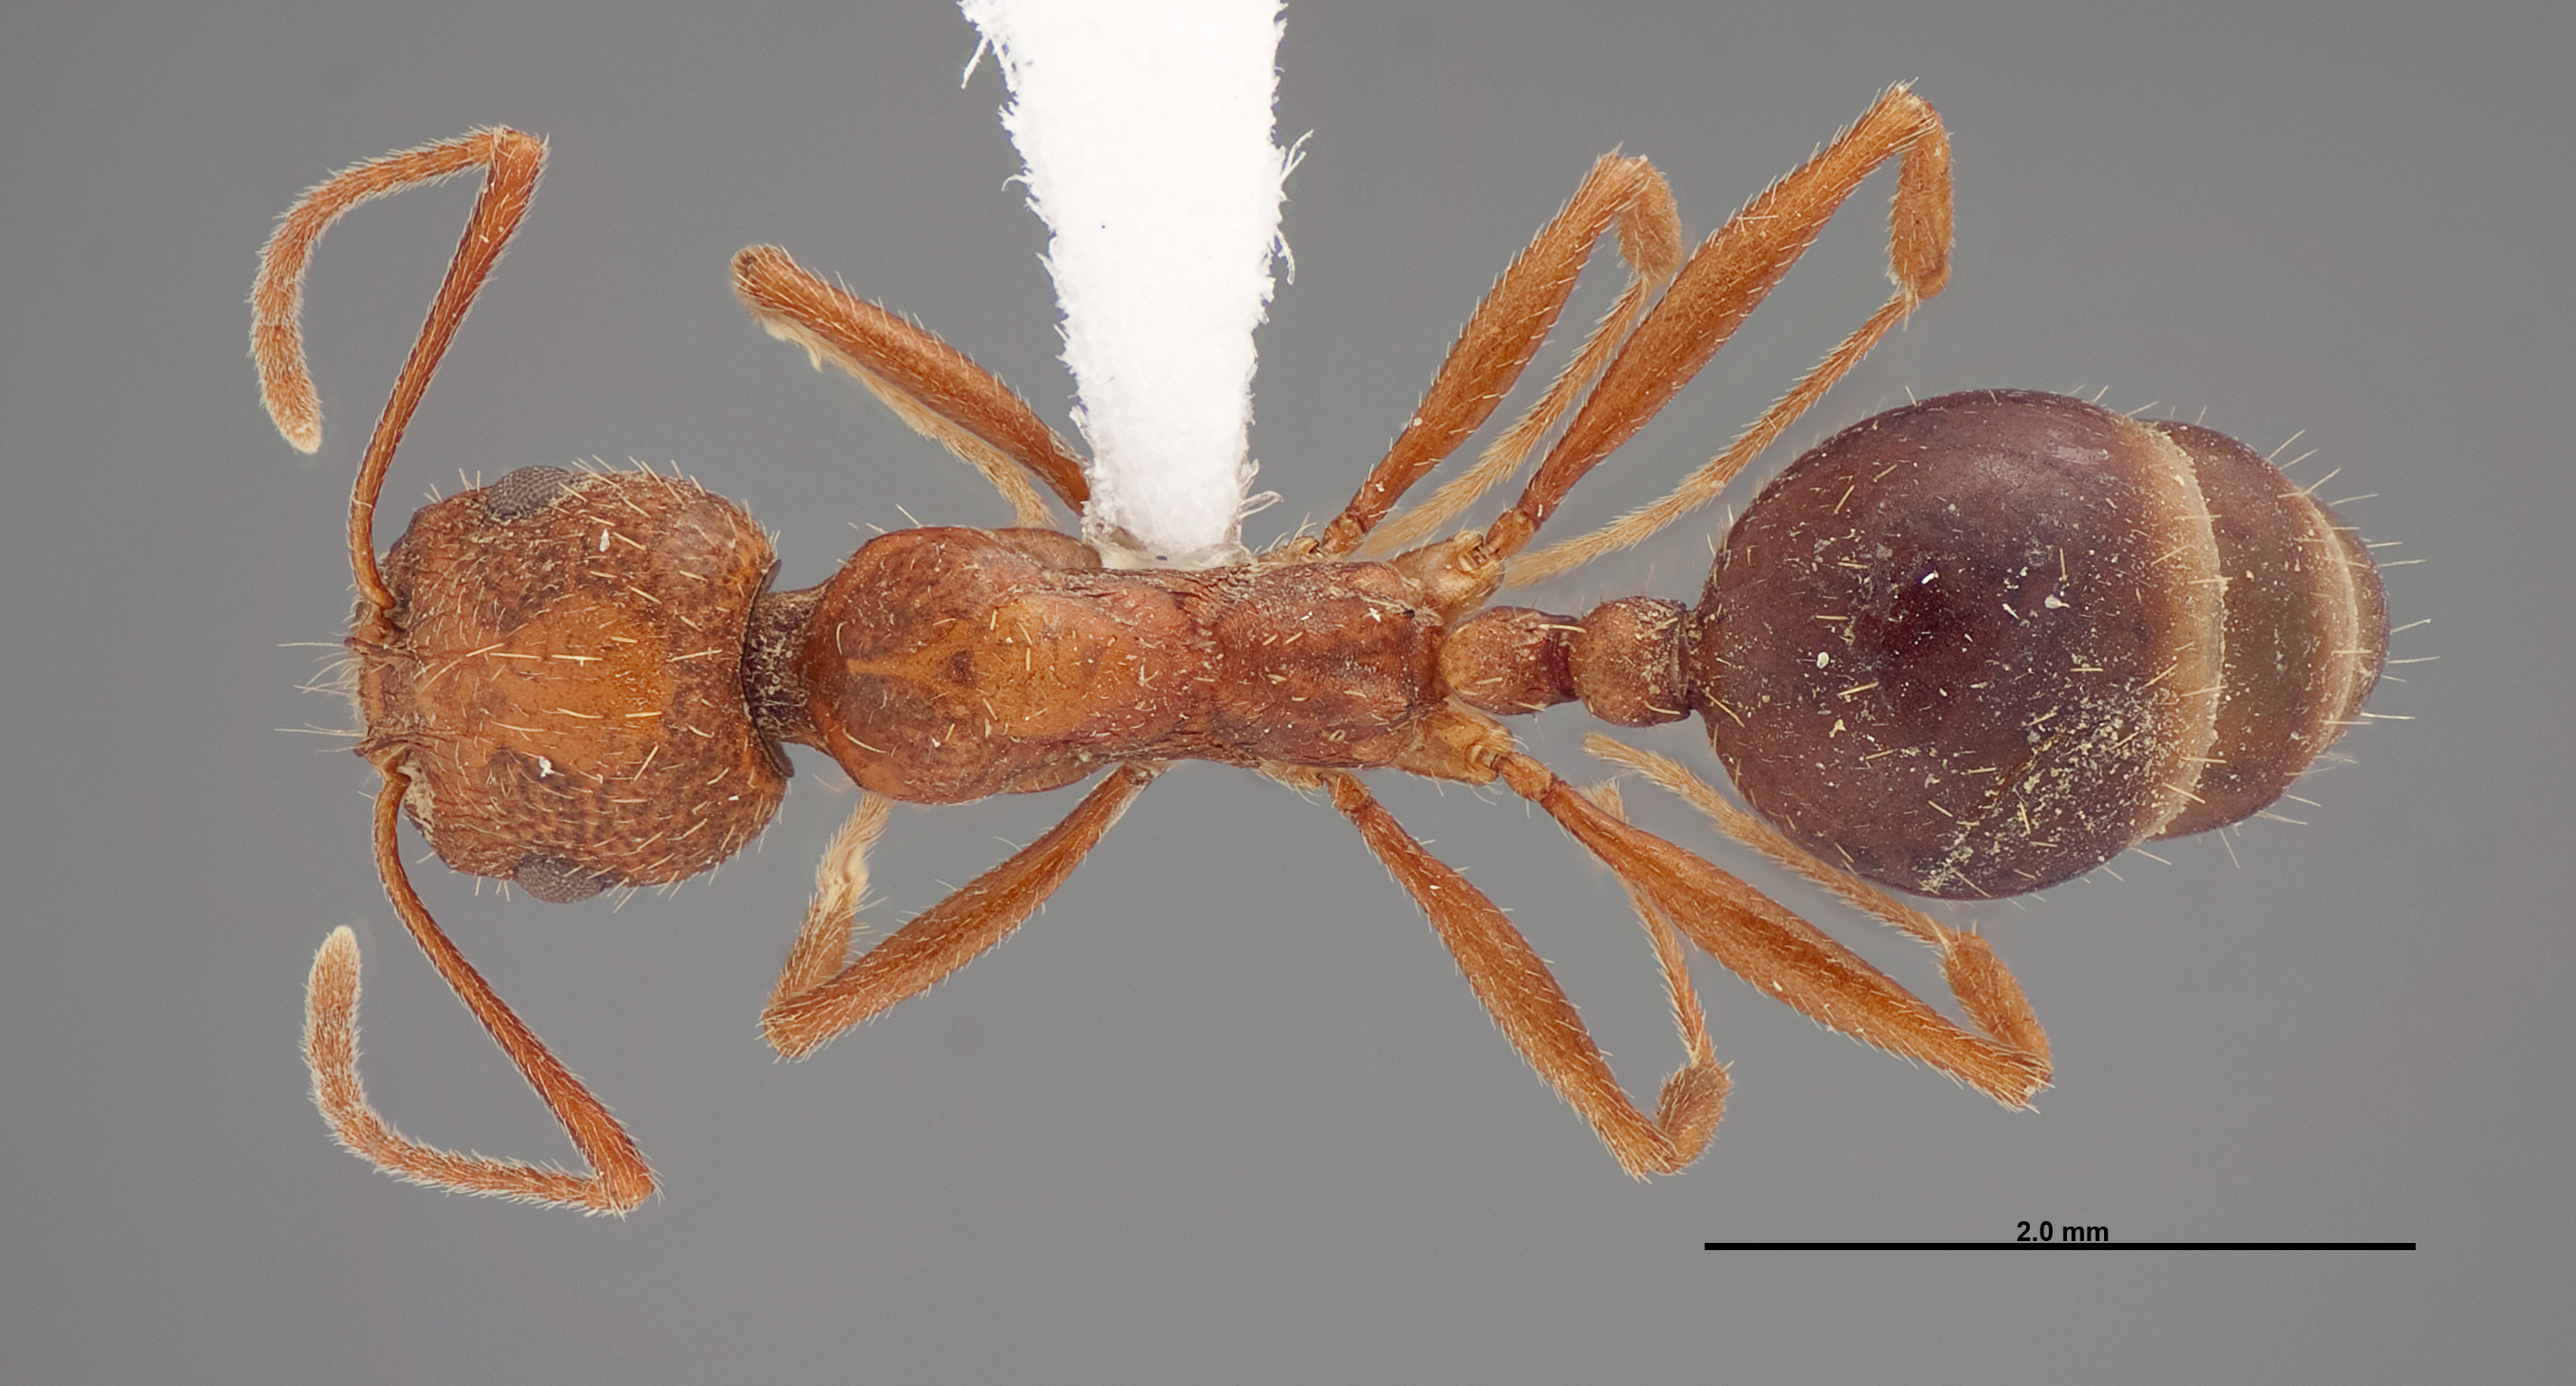 Image of Aphaenogaster uinta